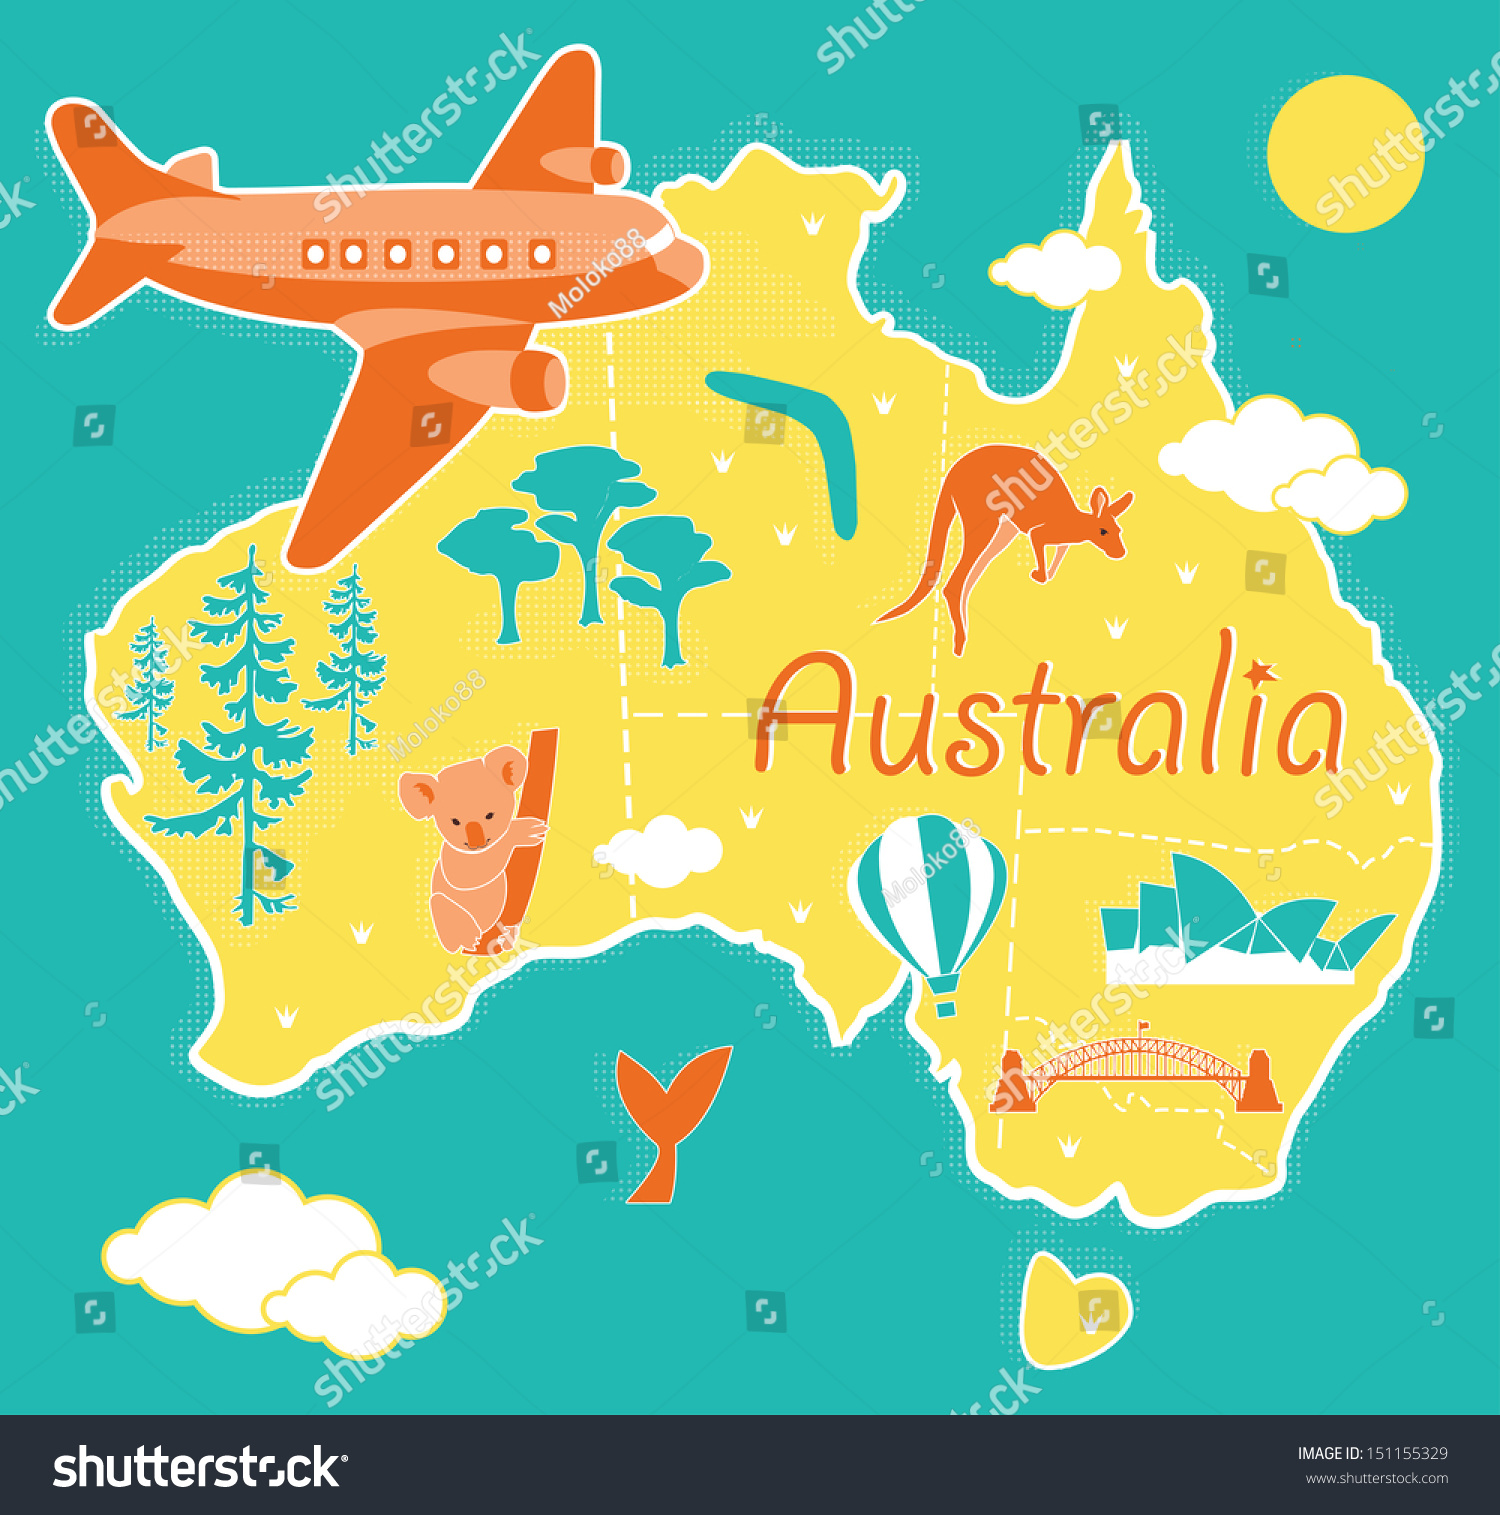 Cartoon Map Australia Vector 151155329 Shutterstock – Map of Australia Images